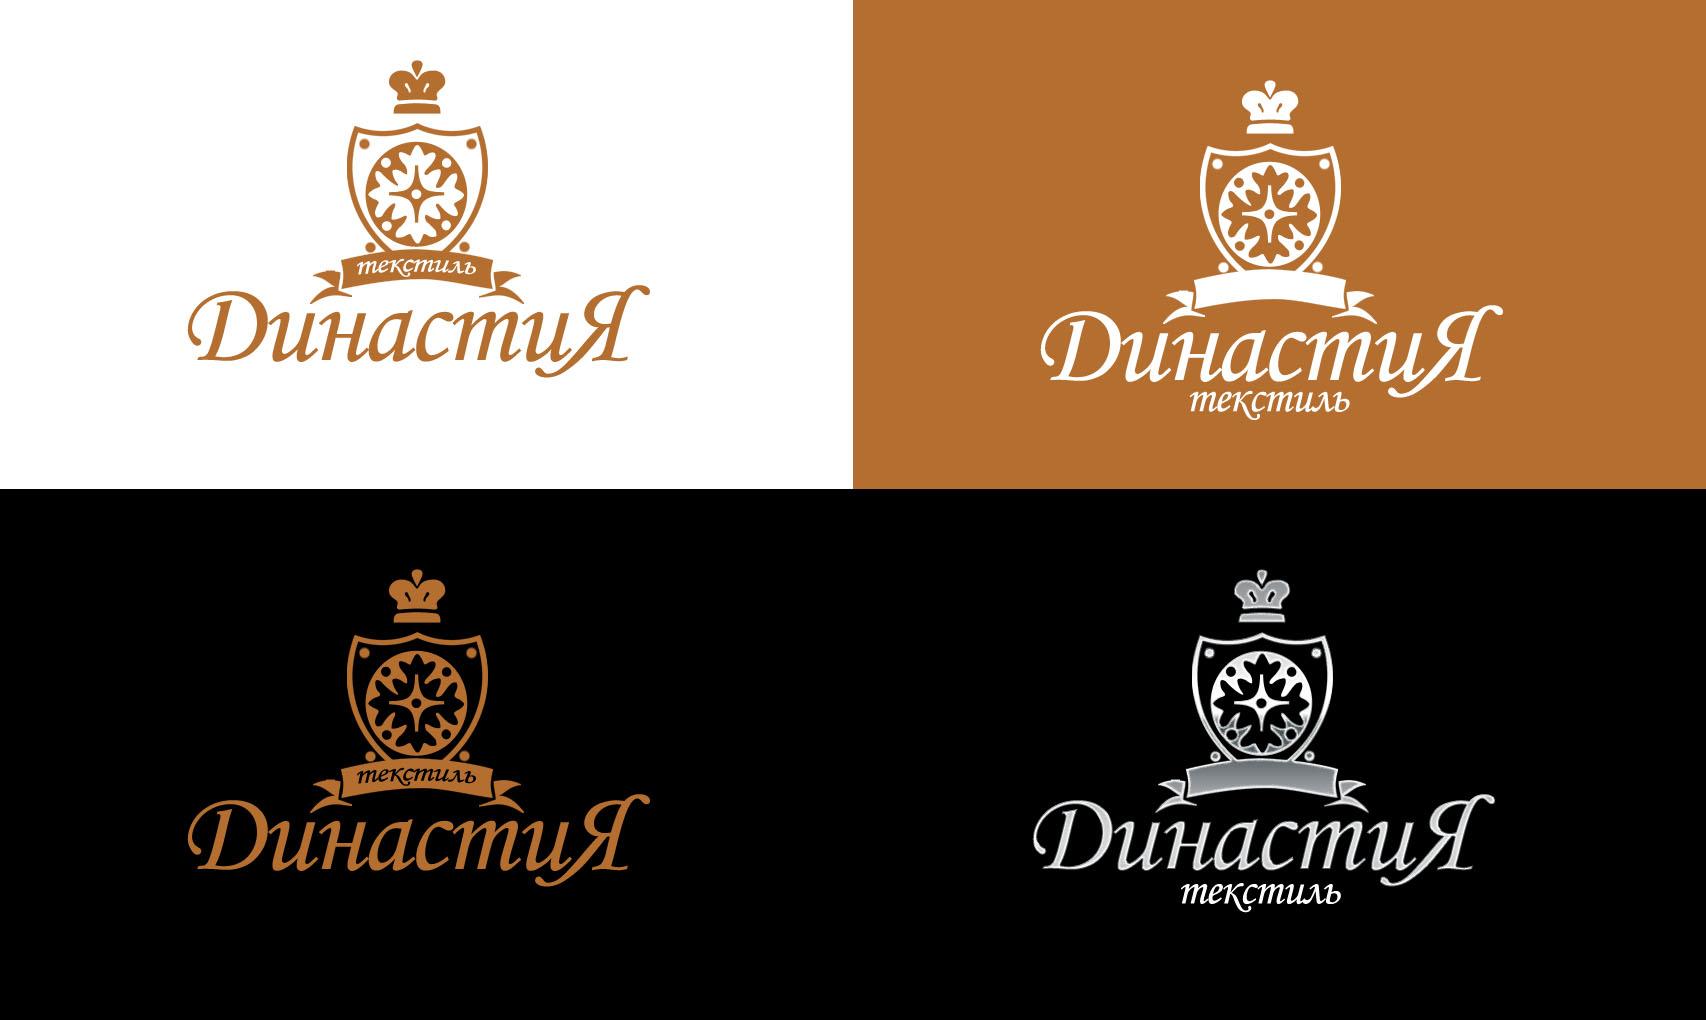 Разработать логотип для нового бренда фото f_02159e3250b14519.jpg